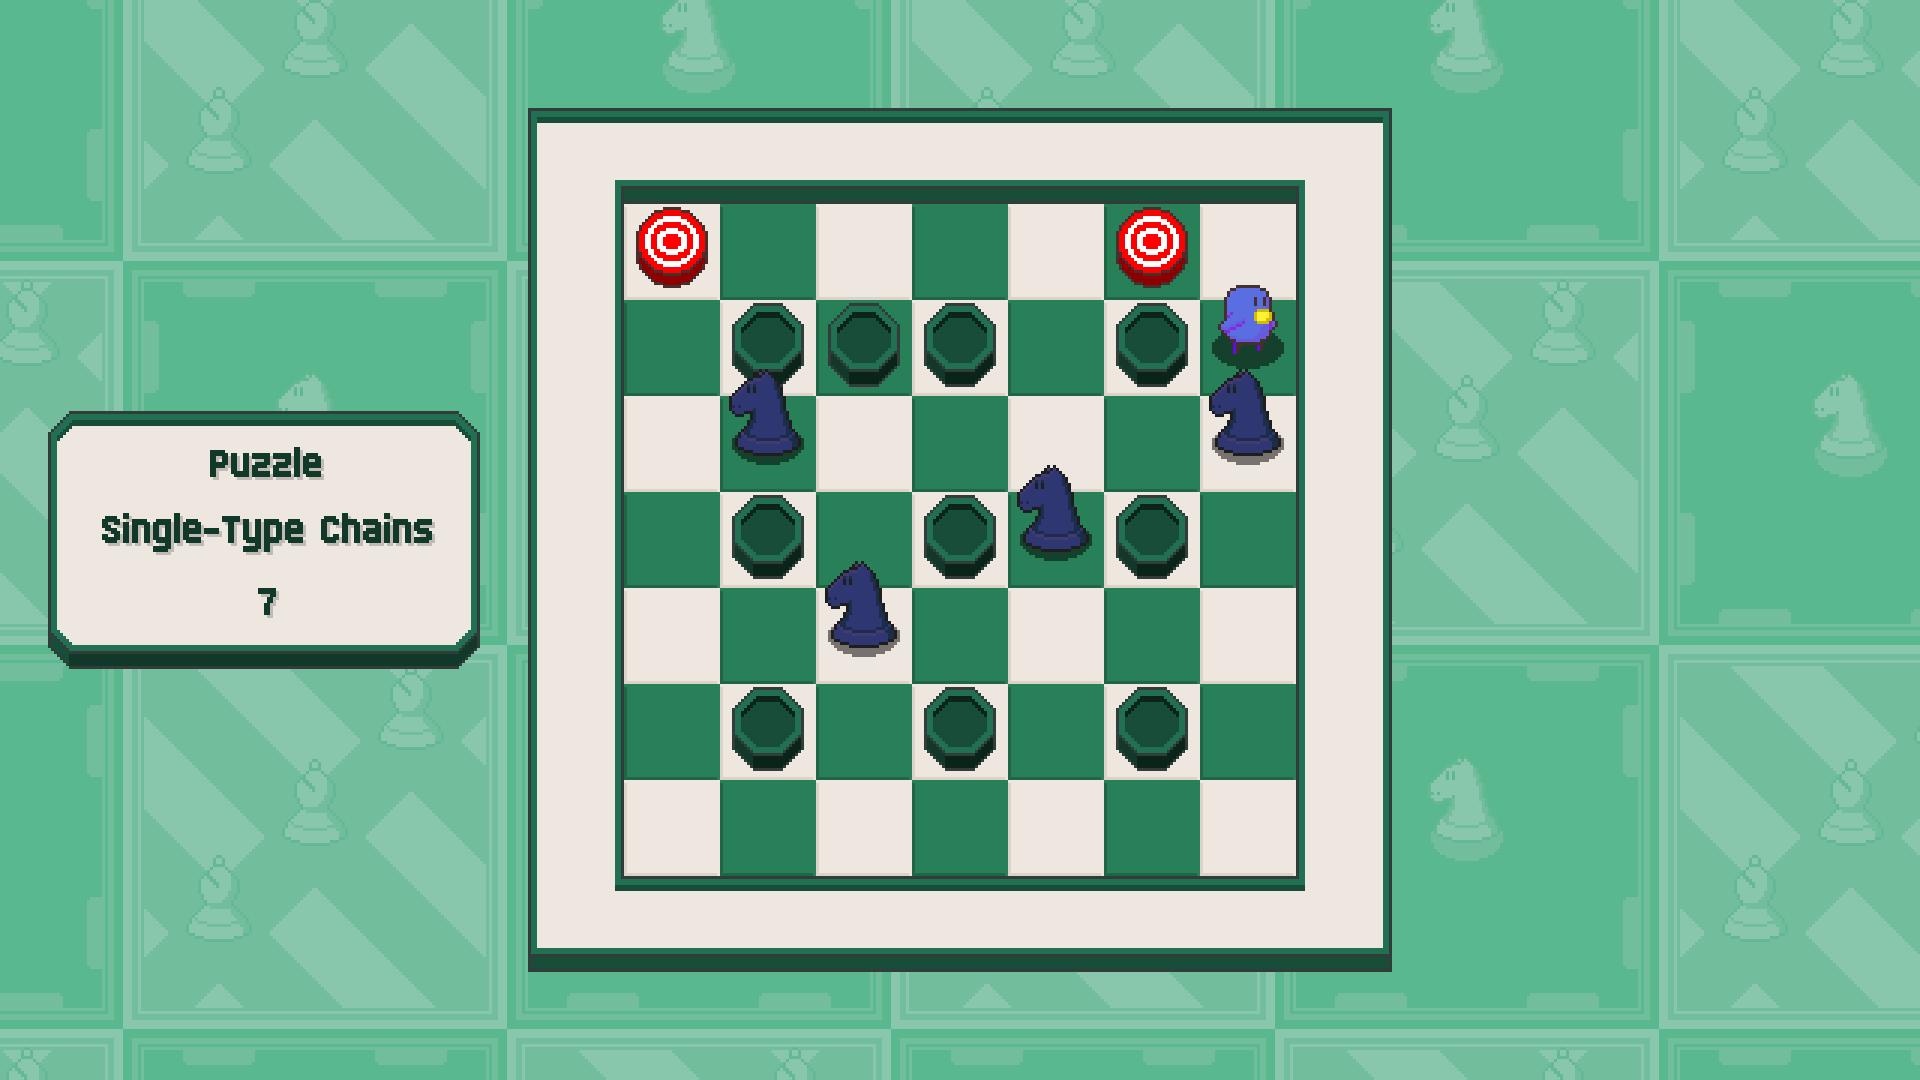 Chessplosion - Puzzle Solution Guide + Achievements Walkthrough - Advanced: Single-Type Chains - 5C939D7